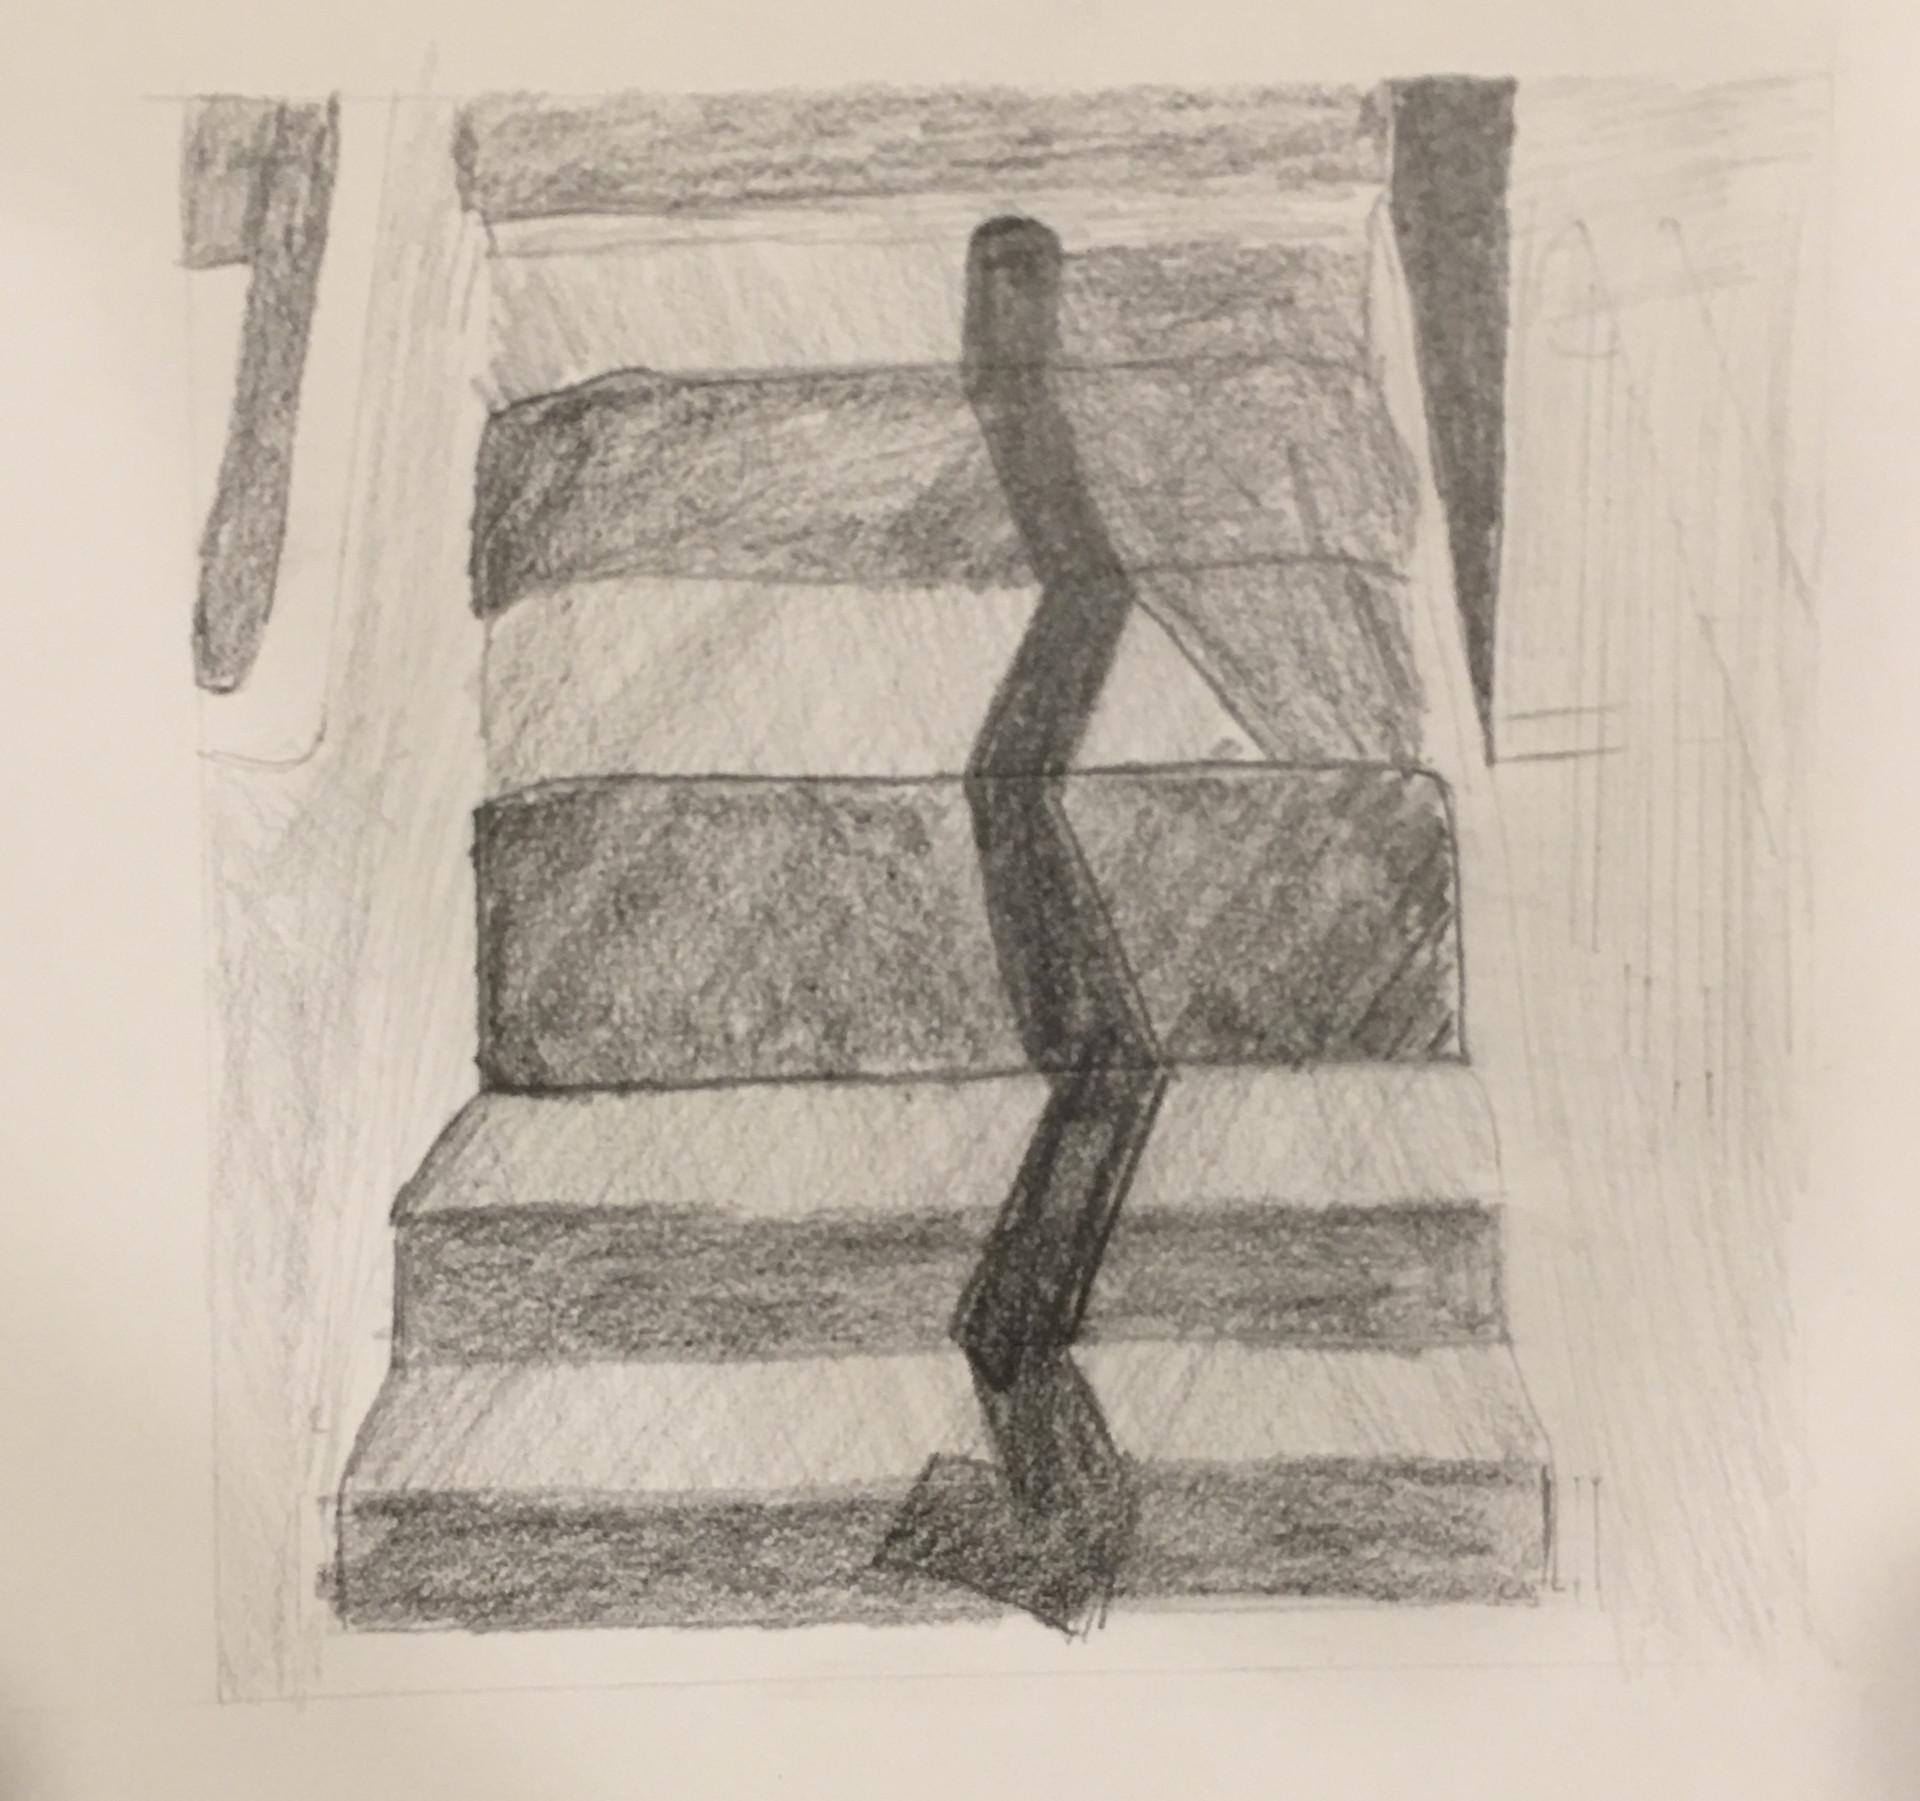 Chris hendrickson hendrickson chris 1f art2 o 1612